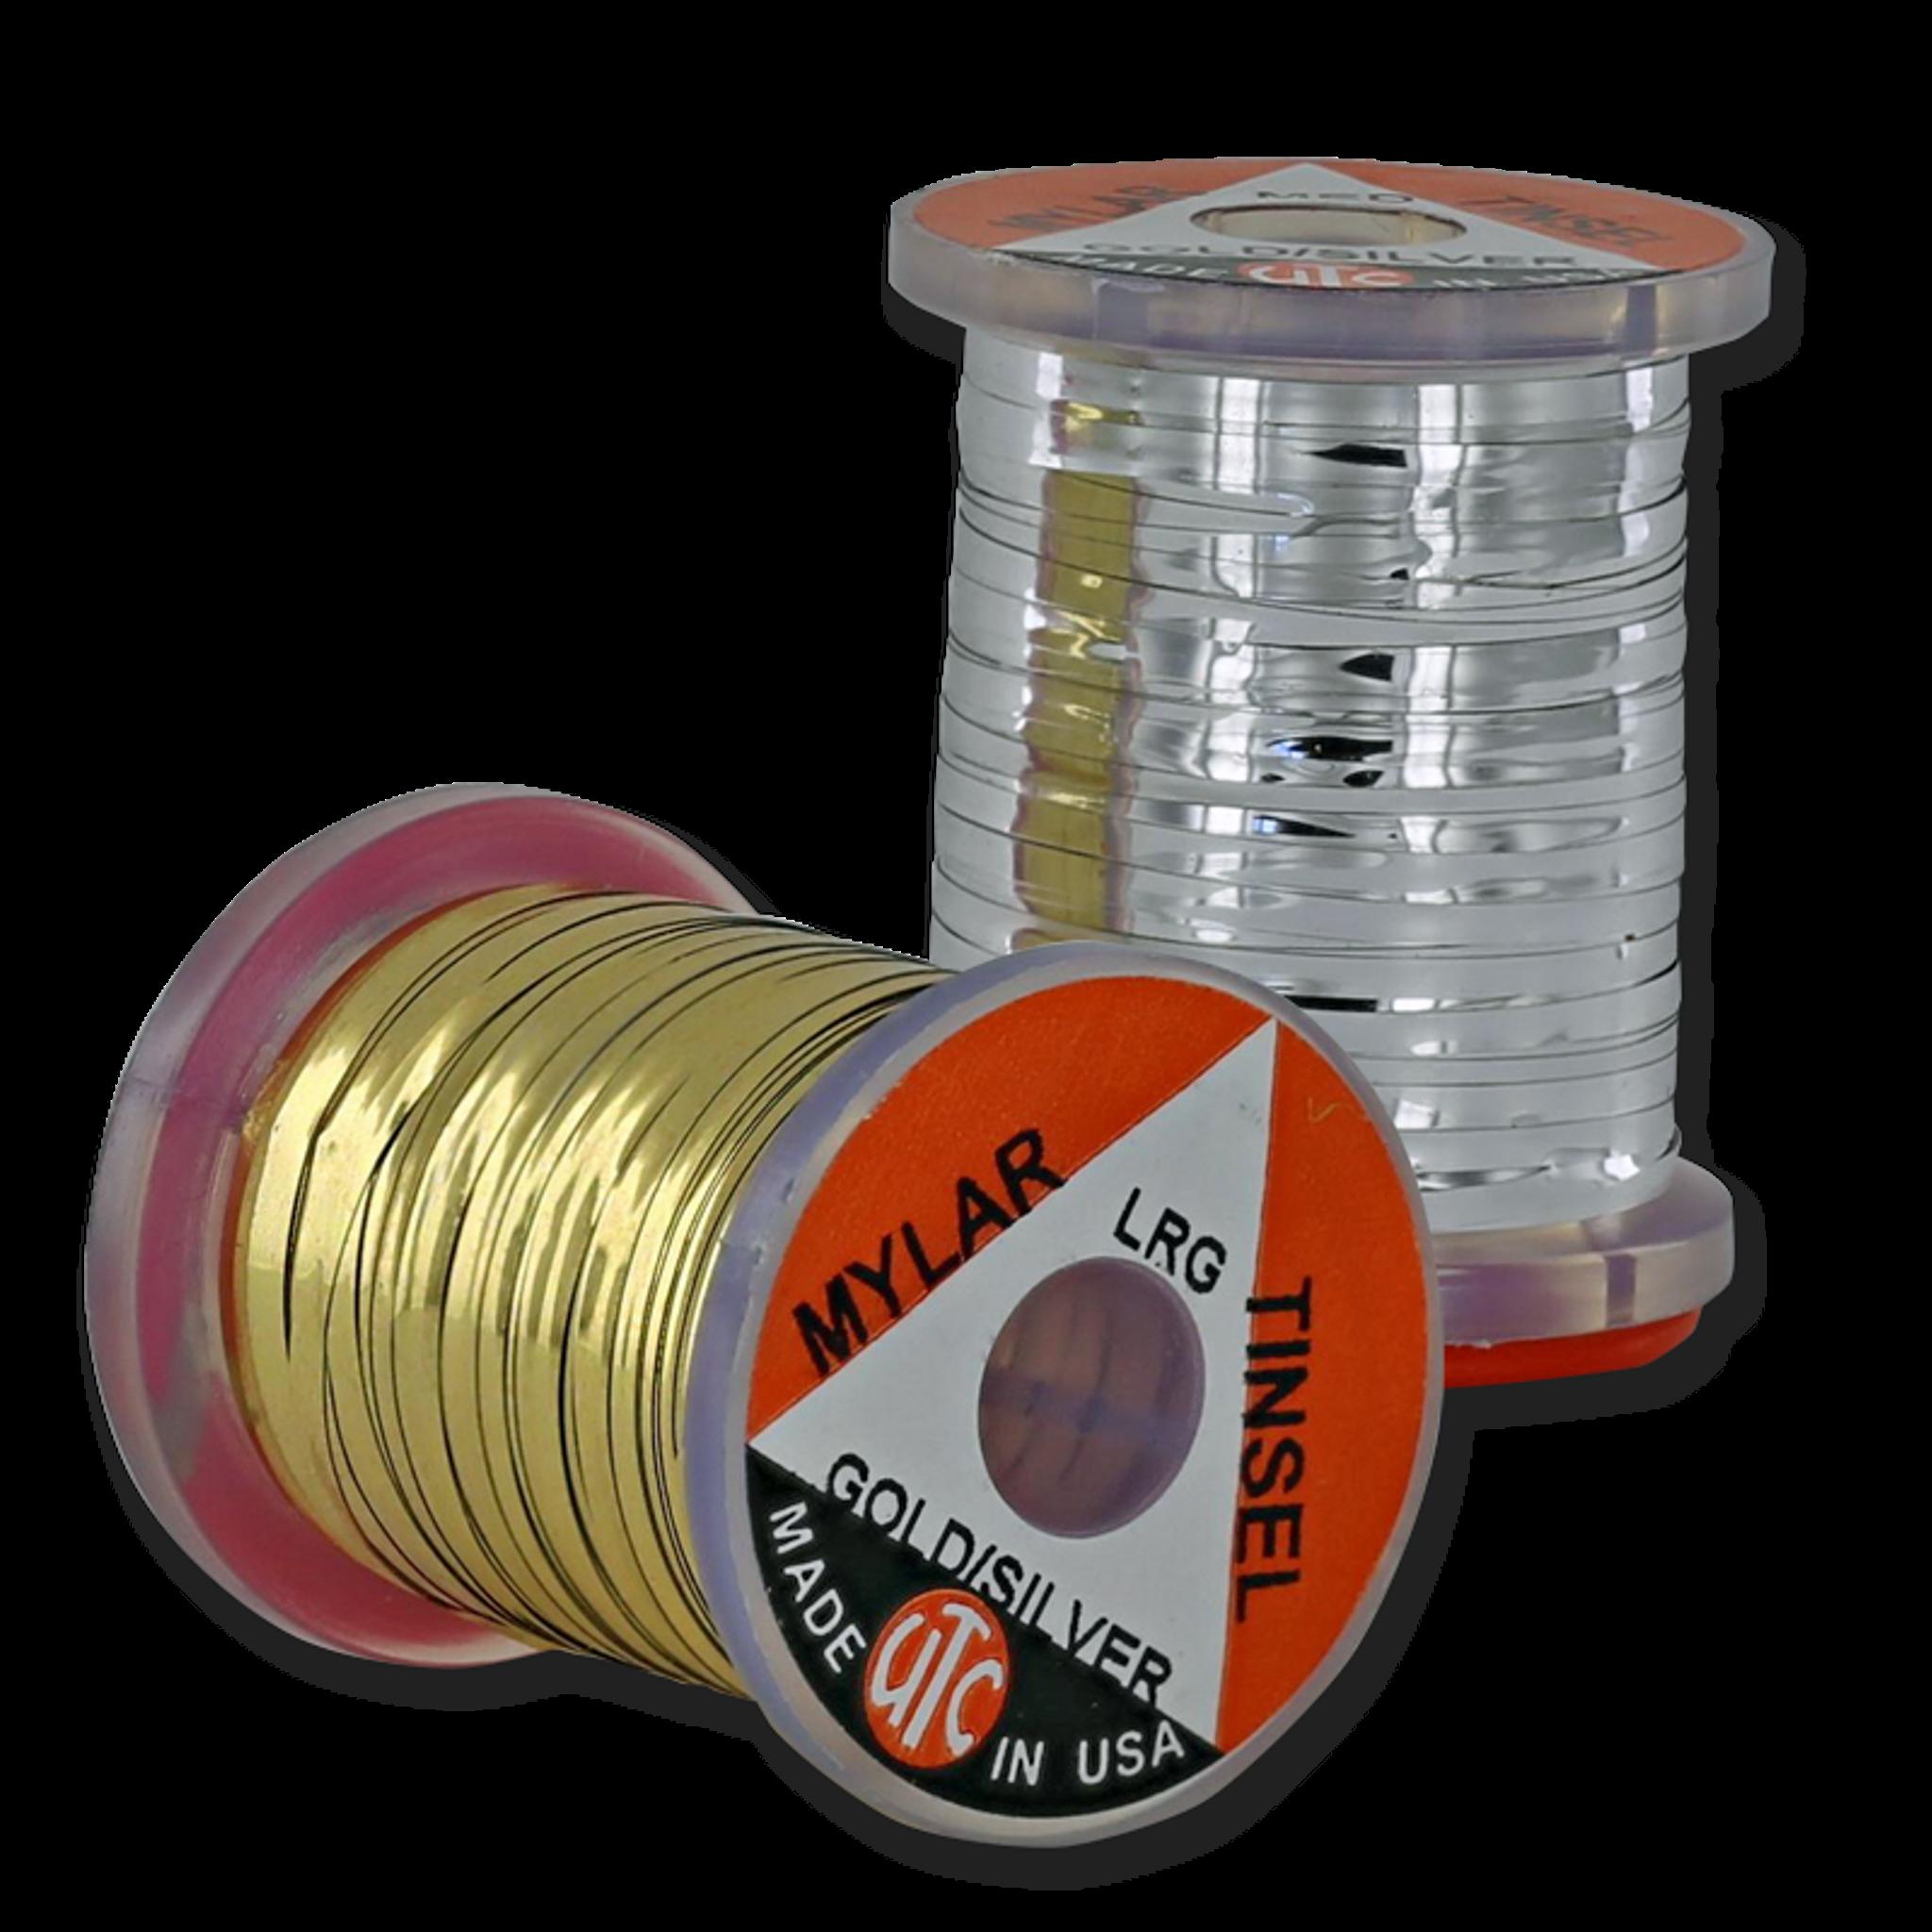 Fly Fishing 12x Spool of Flat Mylar Tinsel GOLD /& SILVER Fly Tying